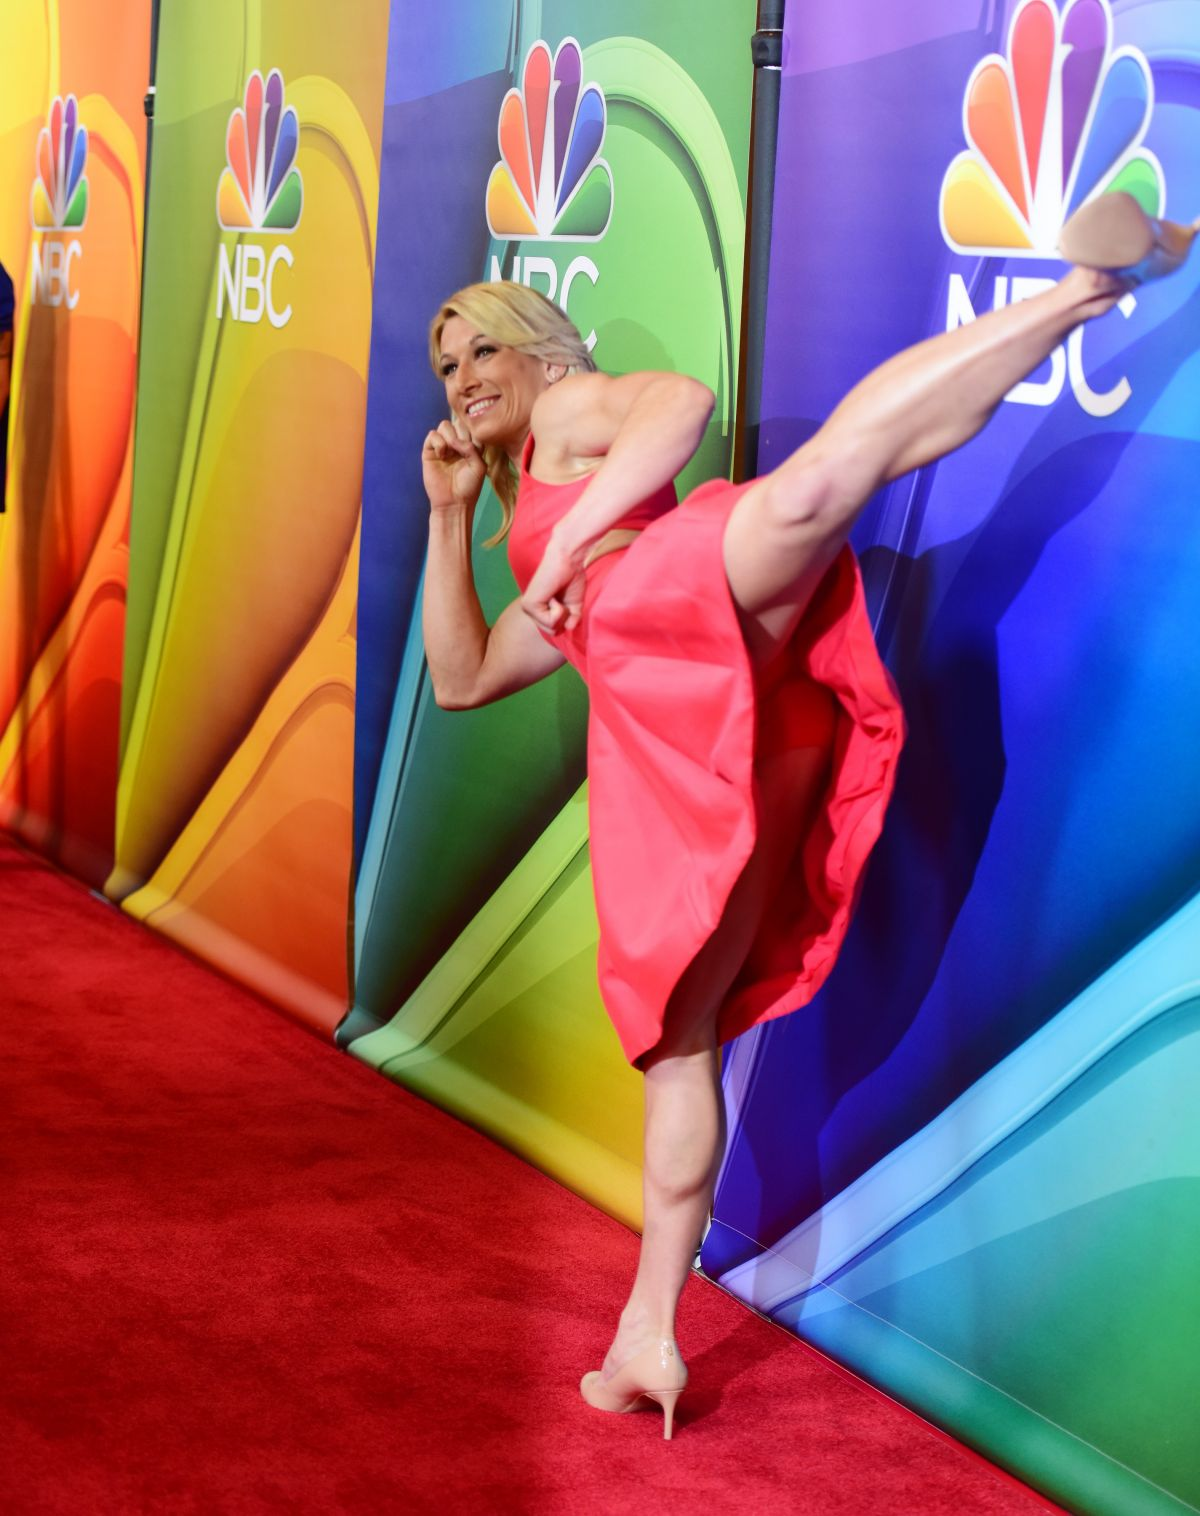 JESSIE GRAFF at NBC Summer Press Tour in Los Angeles 08/03/2017